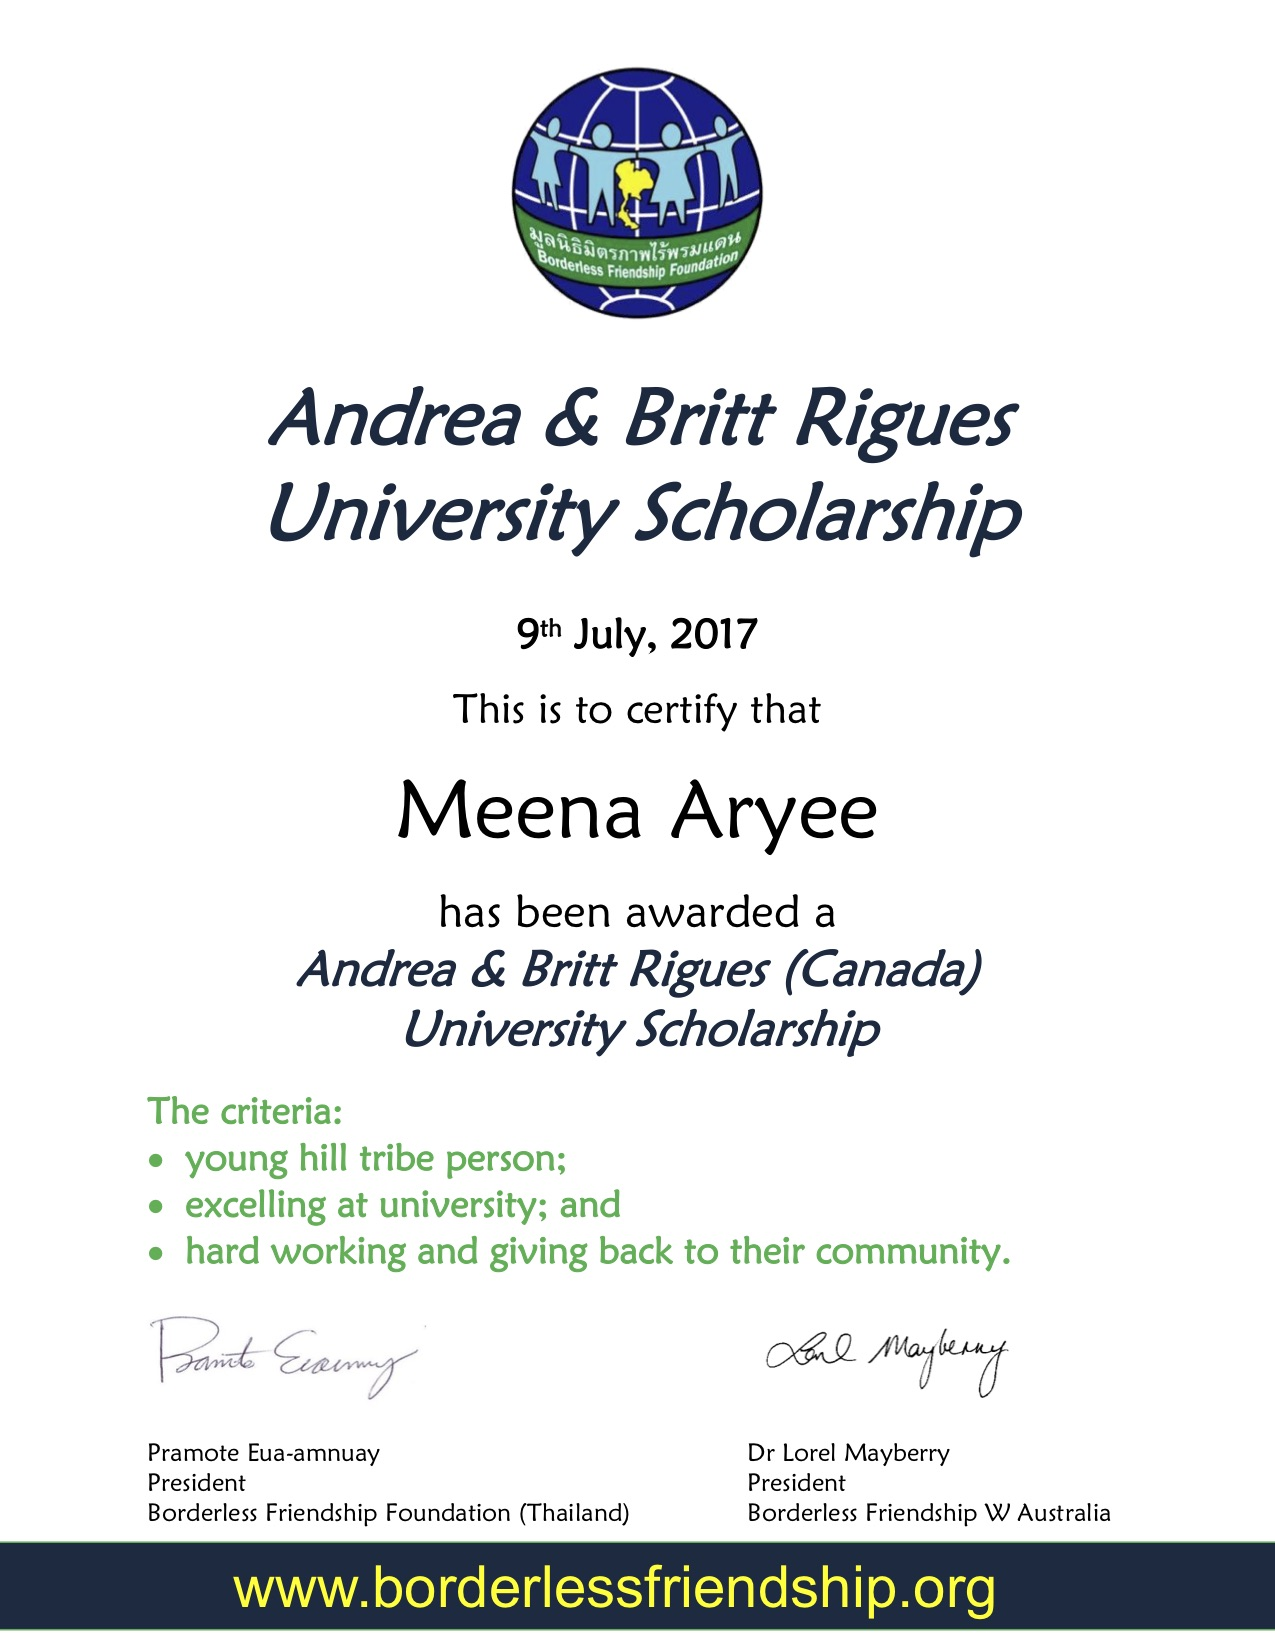 Andrea & Britt Rigues University Scholarship - Meena Aryee.jpg